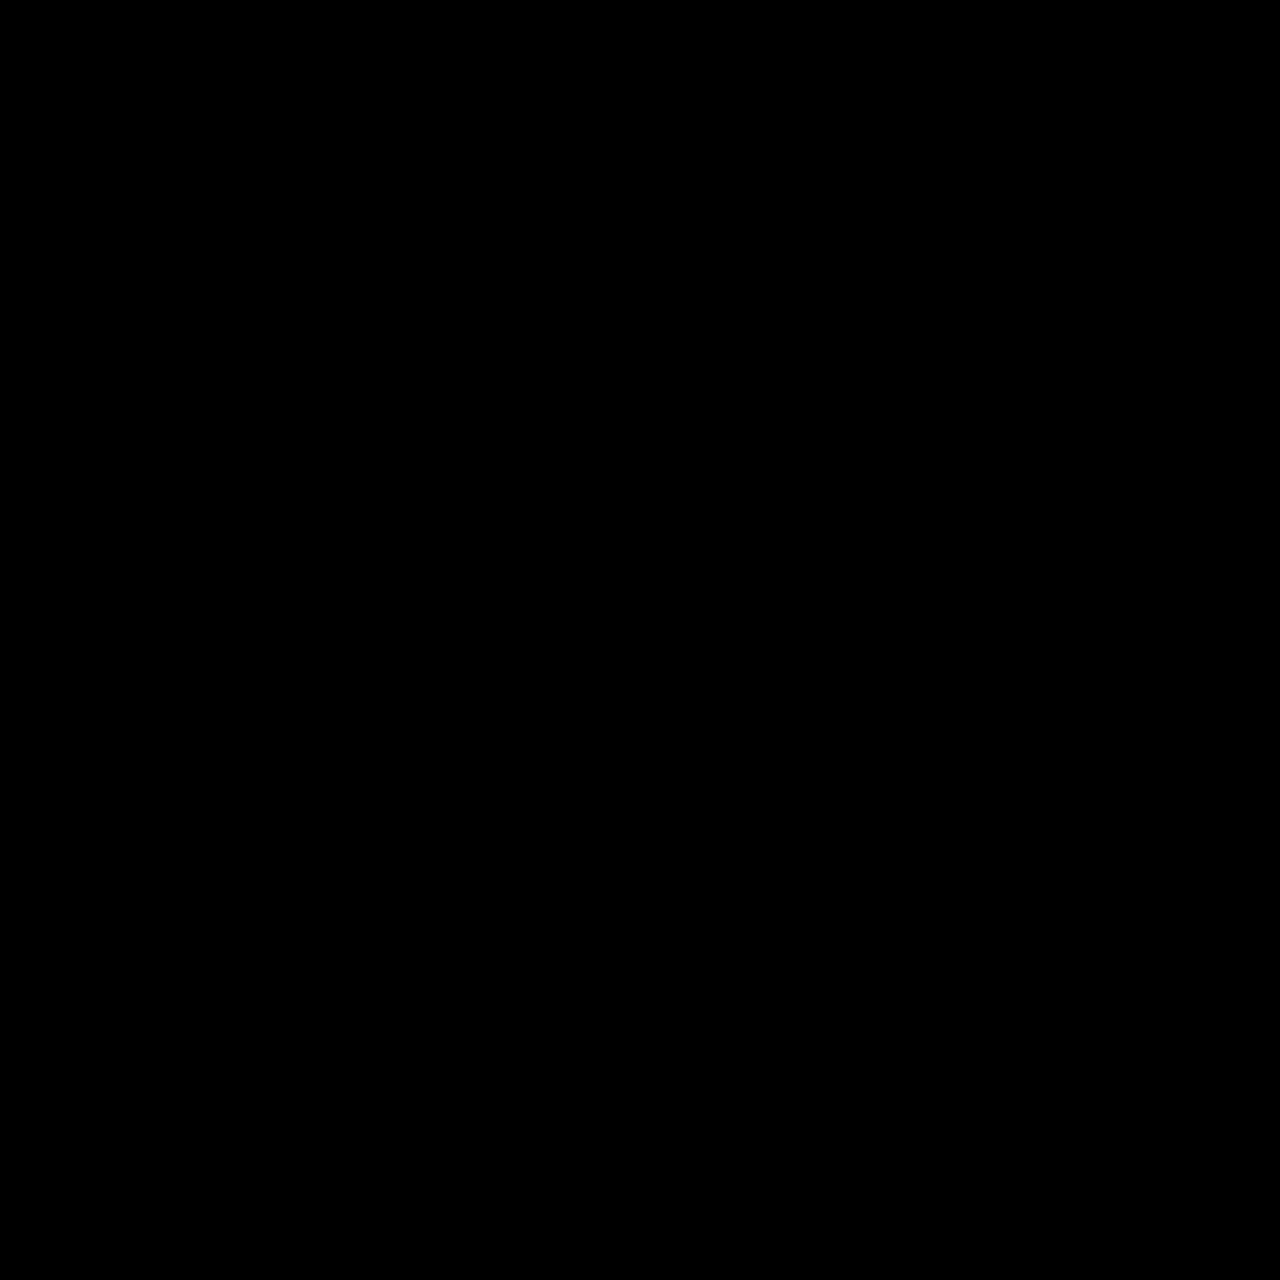 https://radtech.ca/en/wp-content/uploads/sites/6/2021/05/simplicity-logo.png